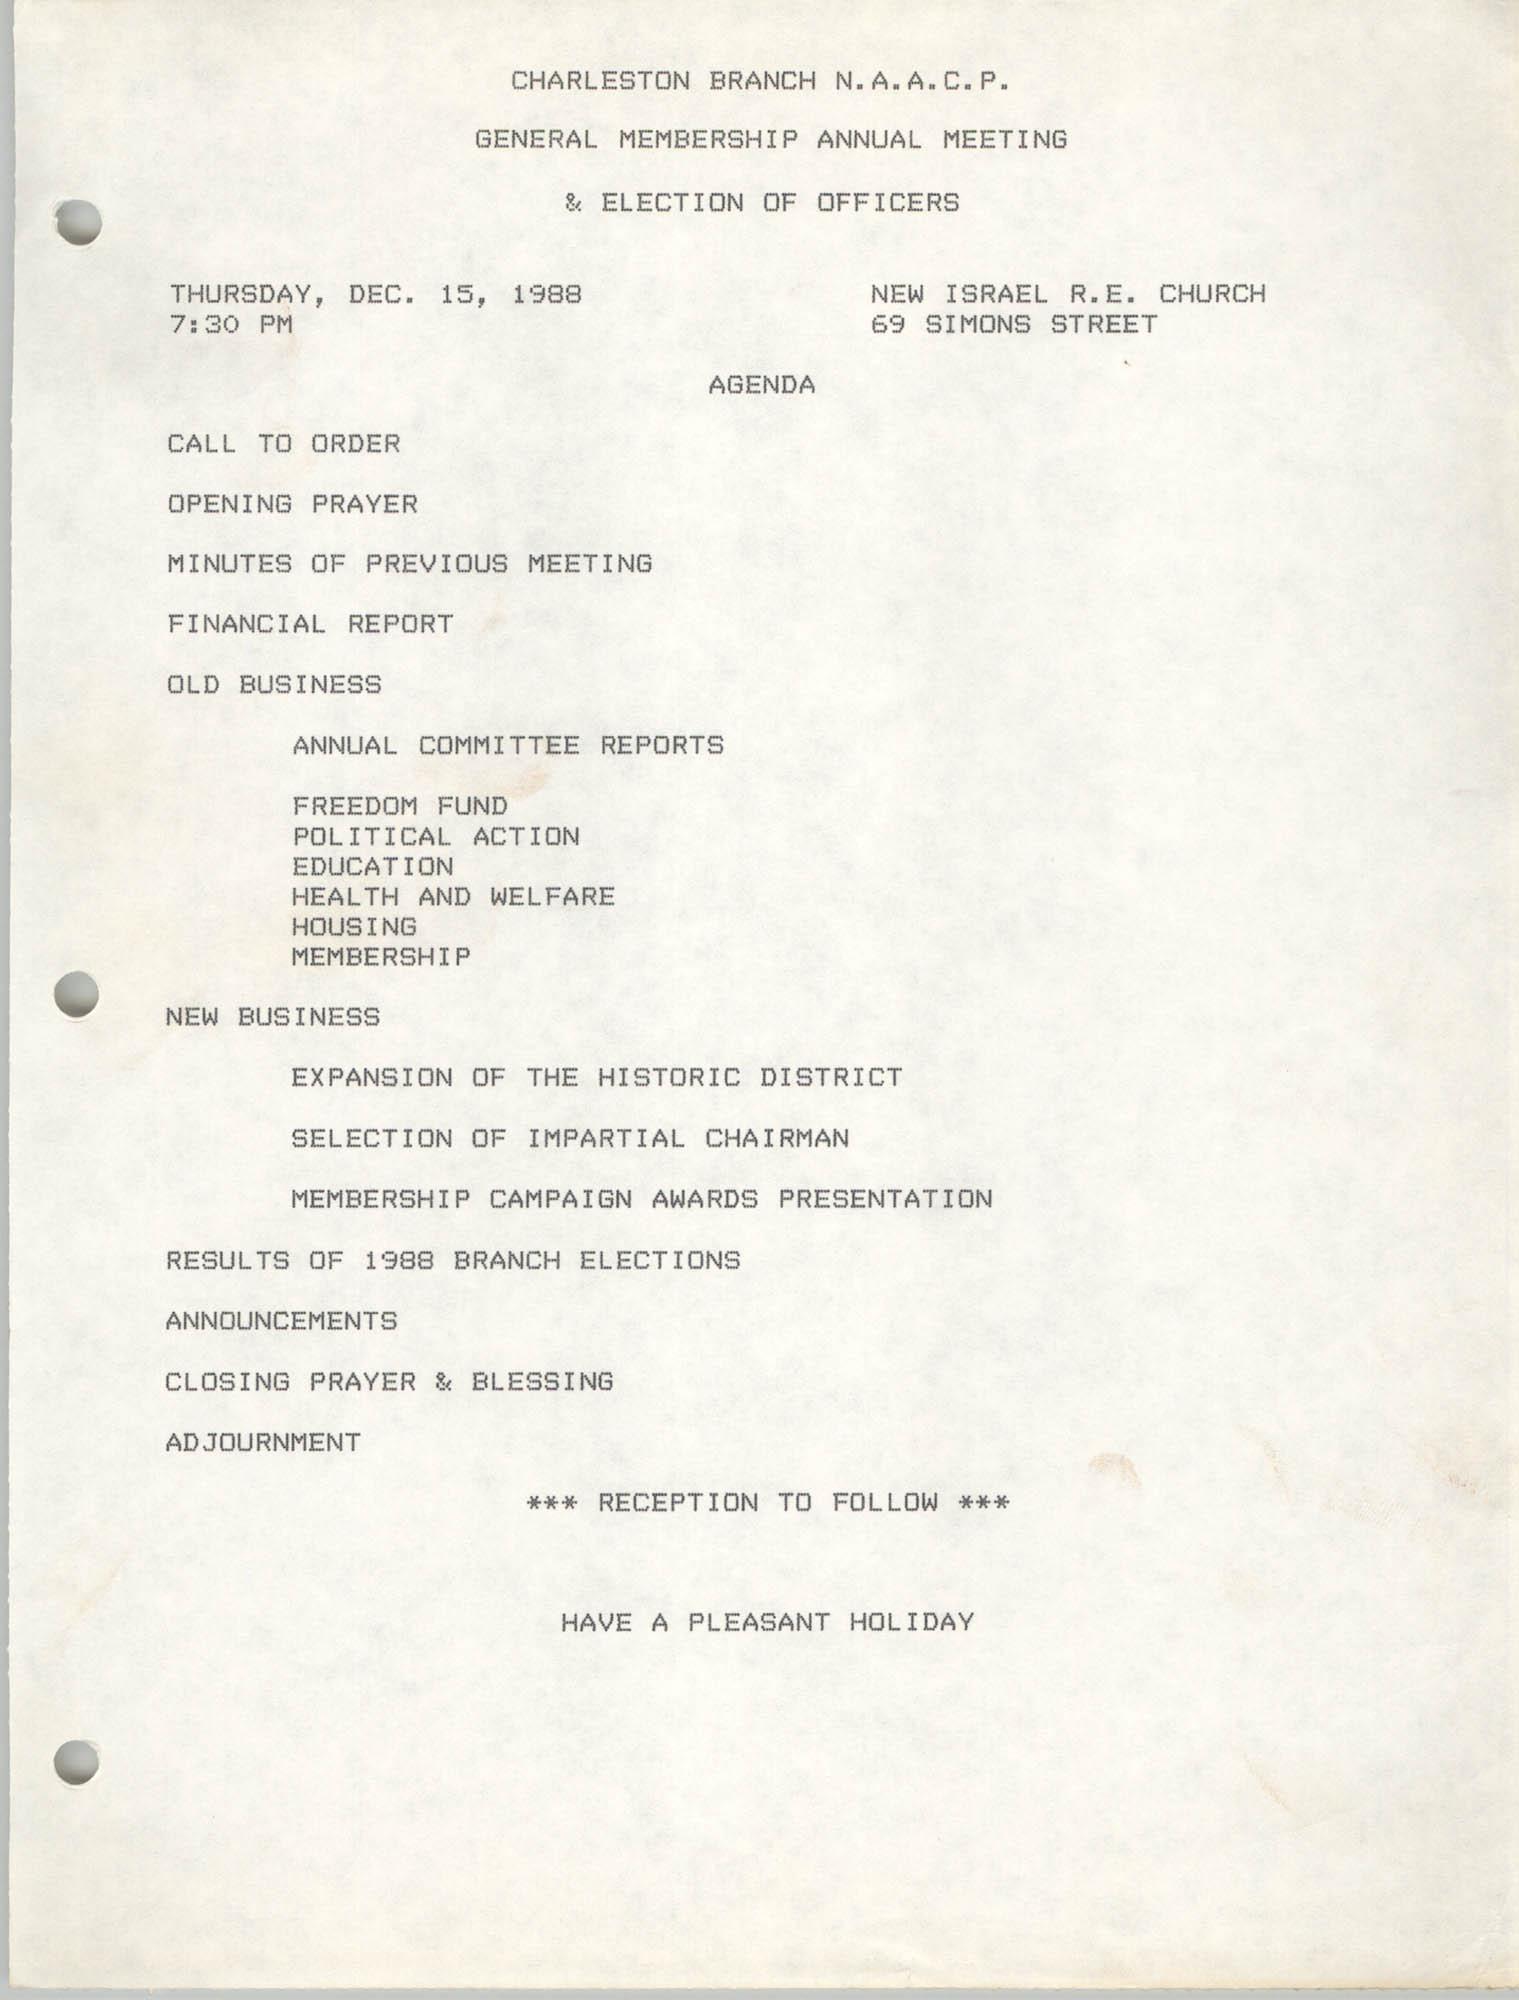 Agenda, Charleston Branch of the NAACP, December 15, 1988